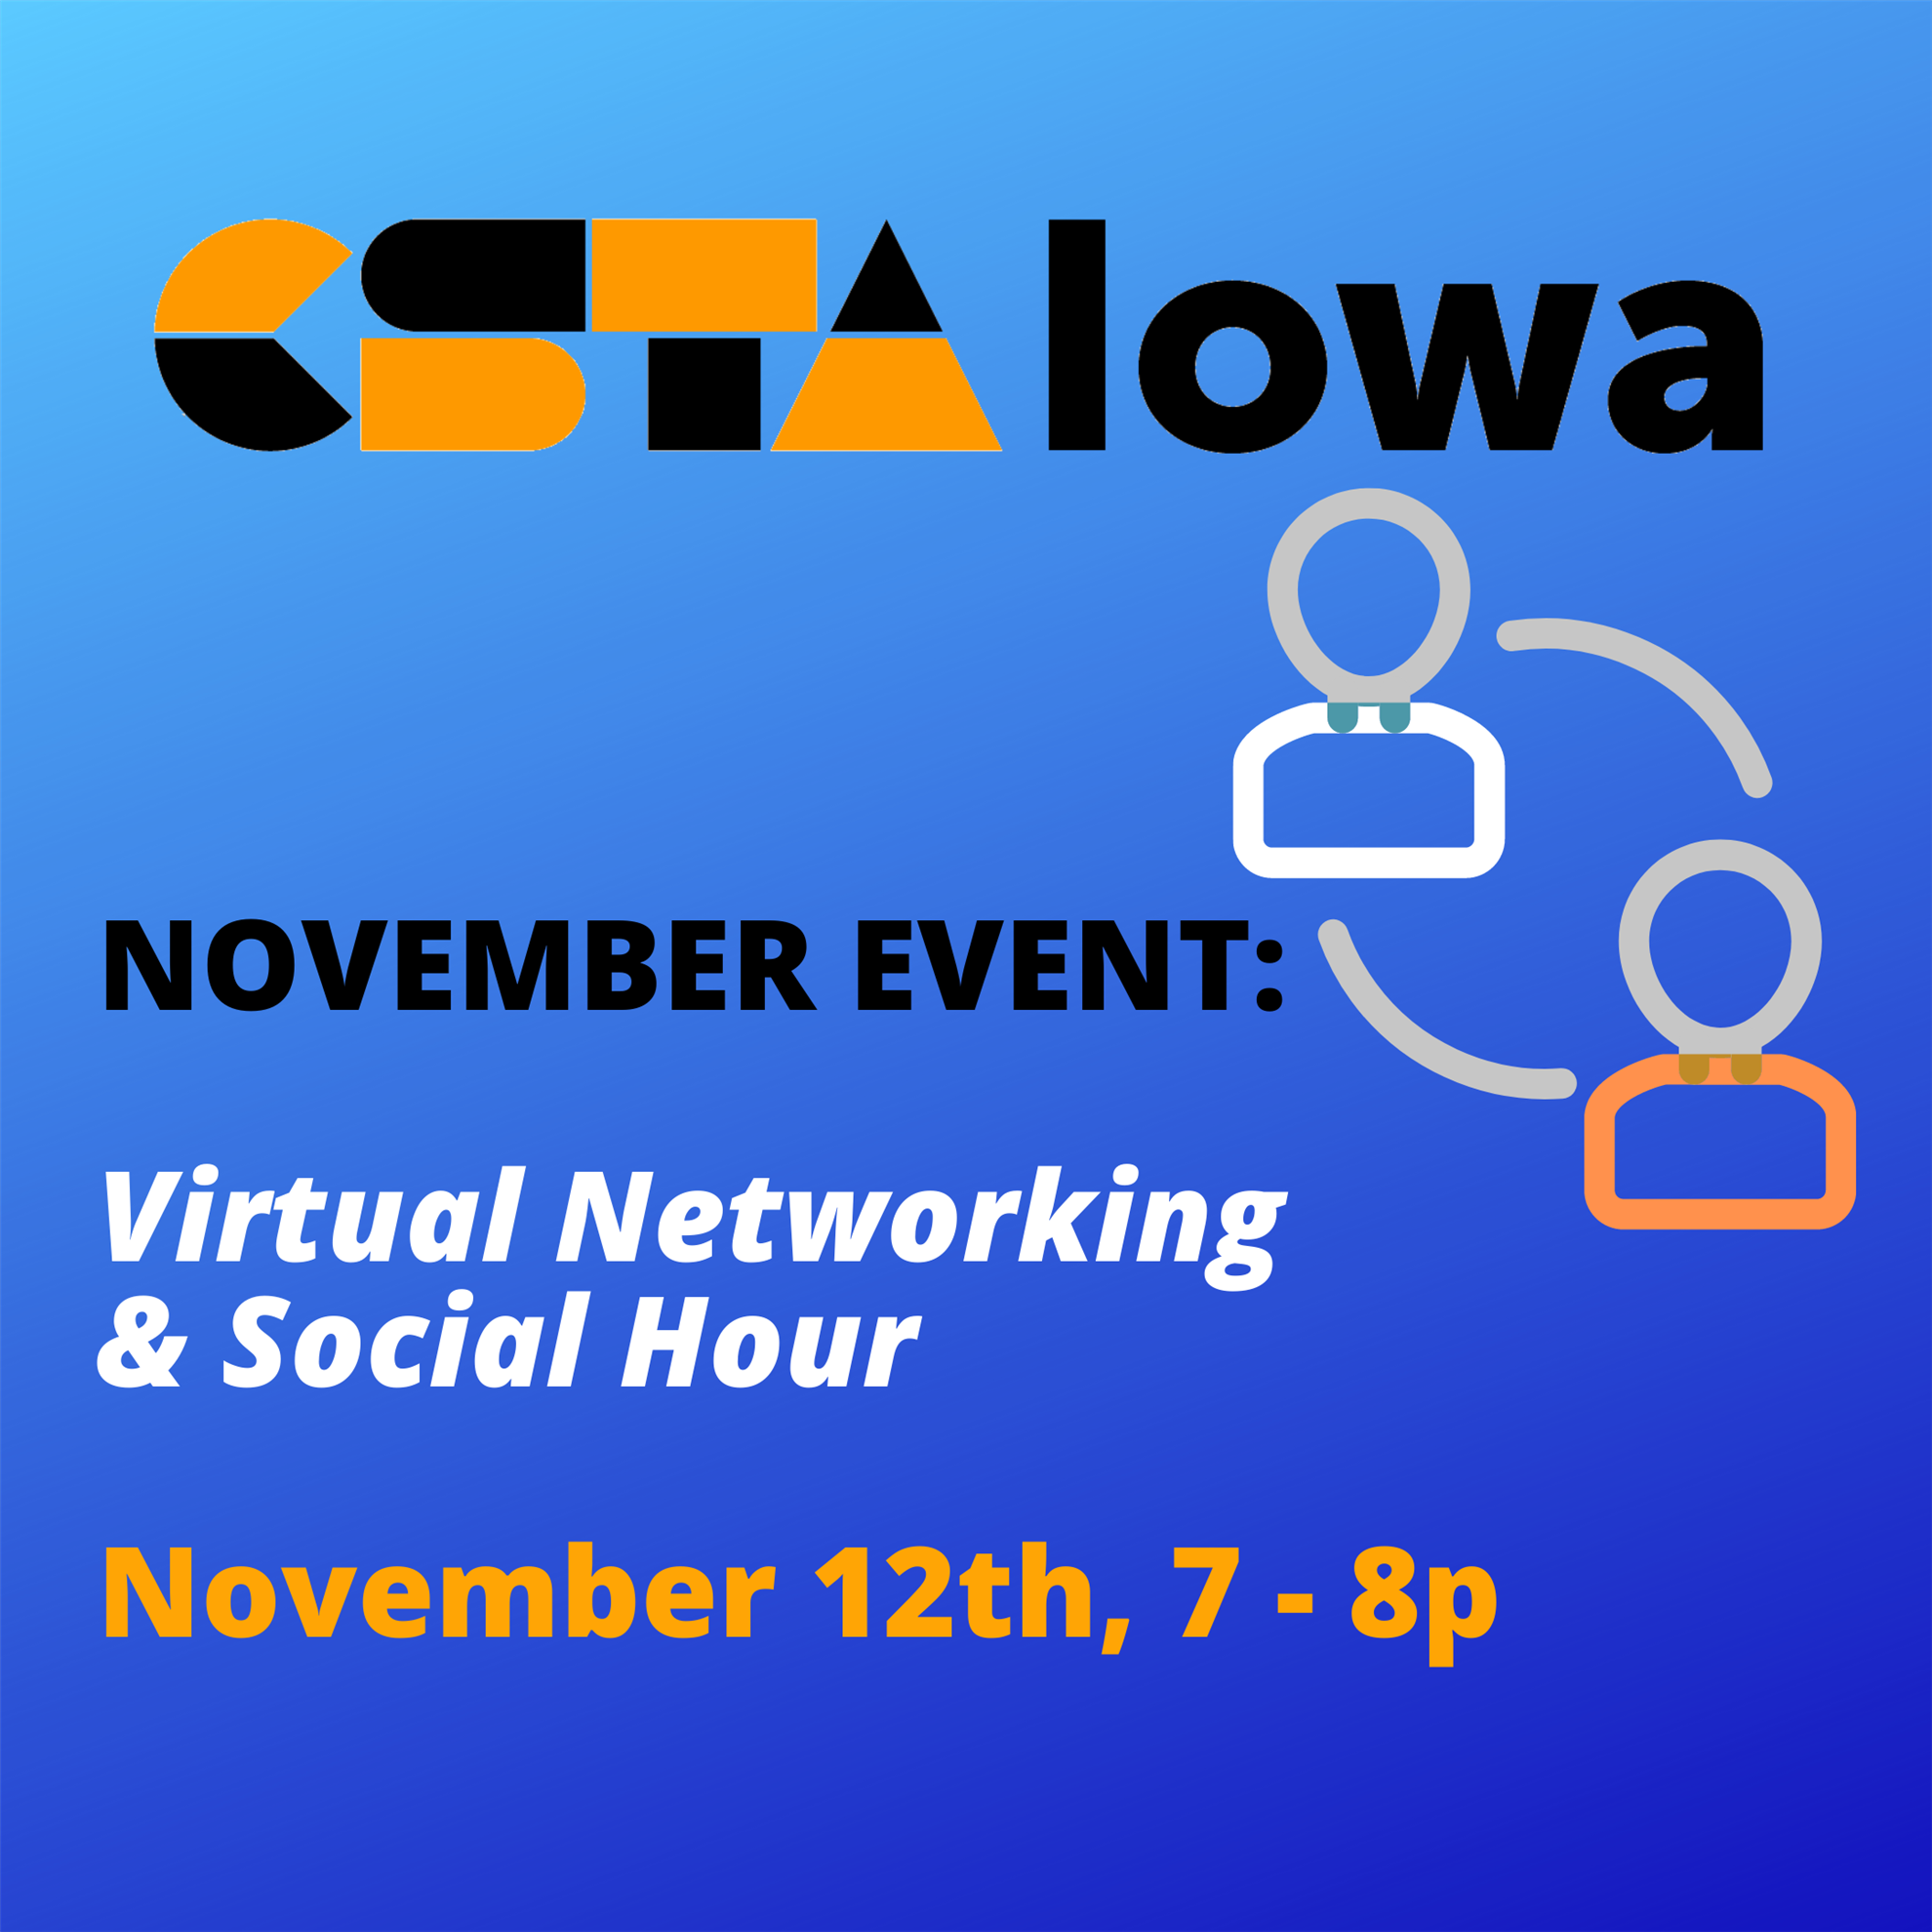 CSTA Iowa November 2020 Virtual Networking & Social Hour